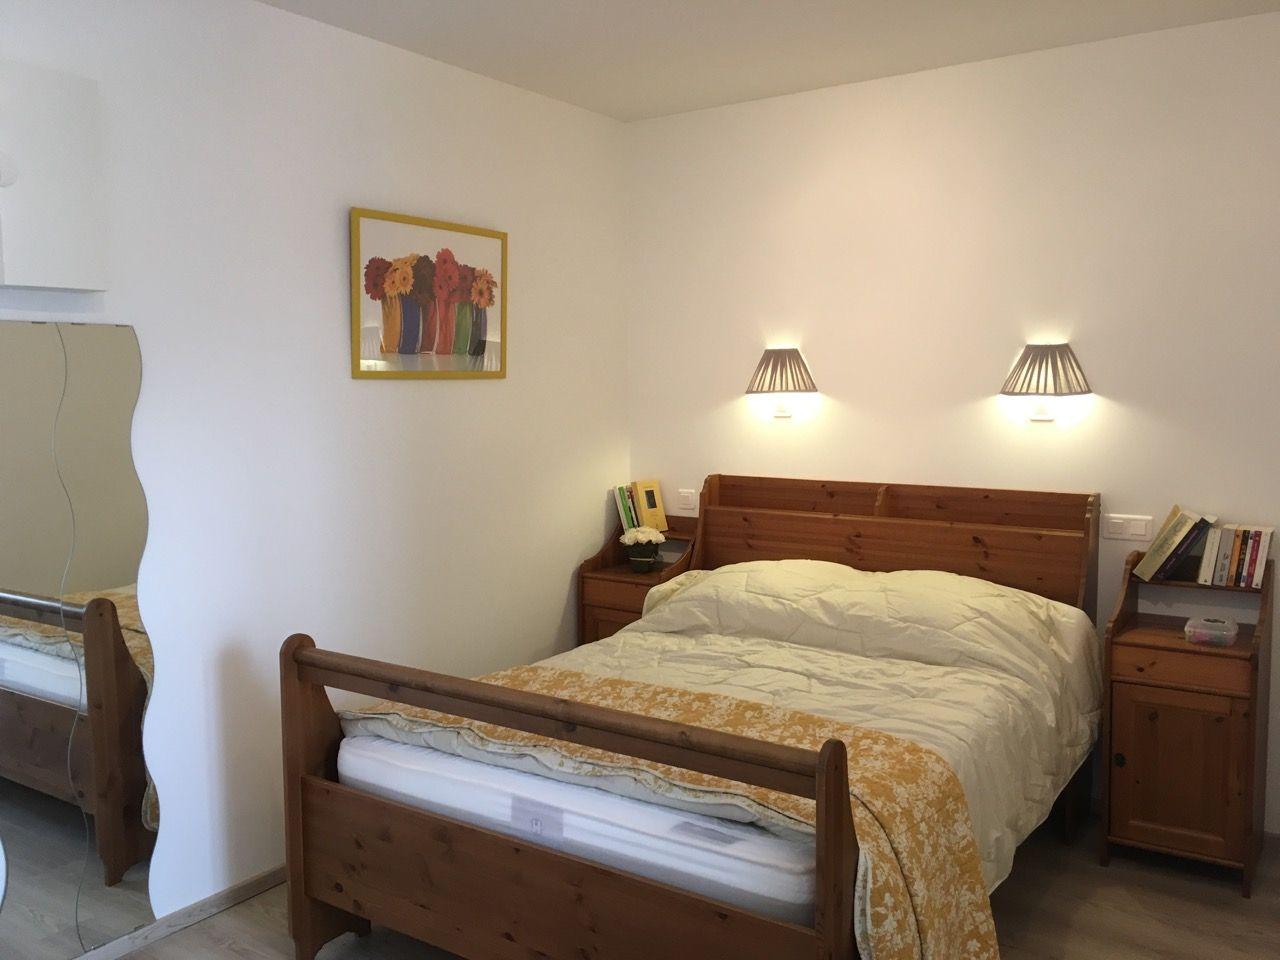 meuble boucher jean pierre studio n 245 lorraine tourisme. Black Bedroom Furniture Sets. Home Design Ideas